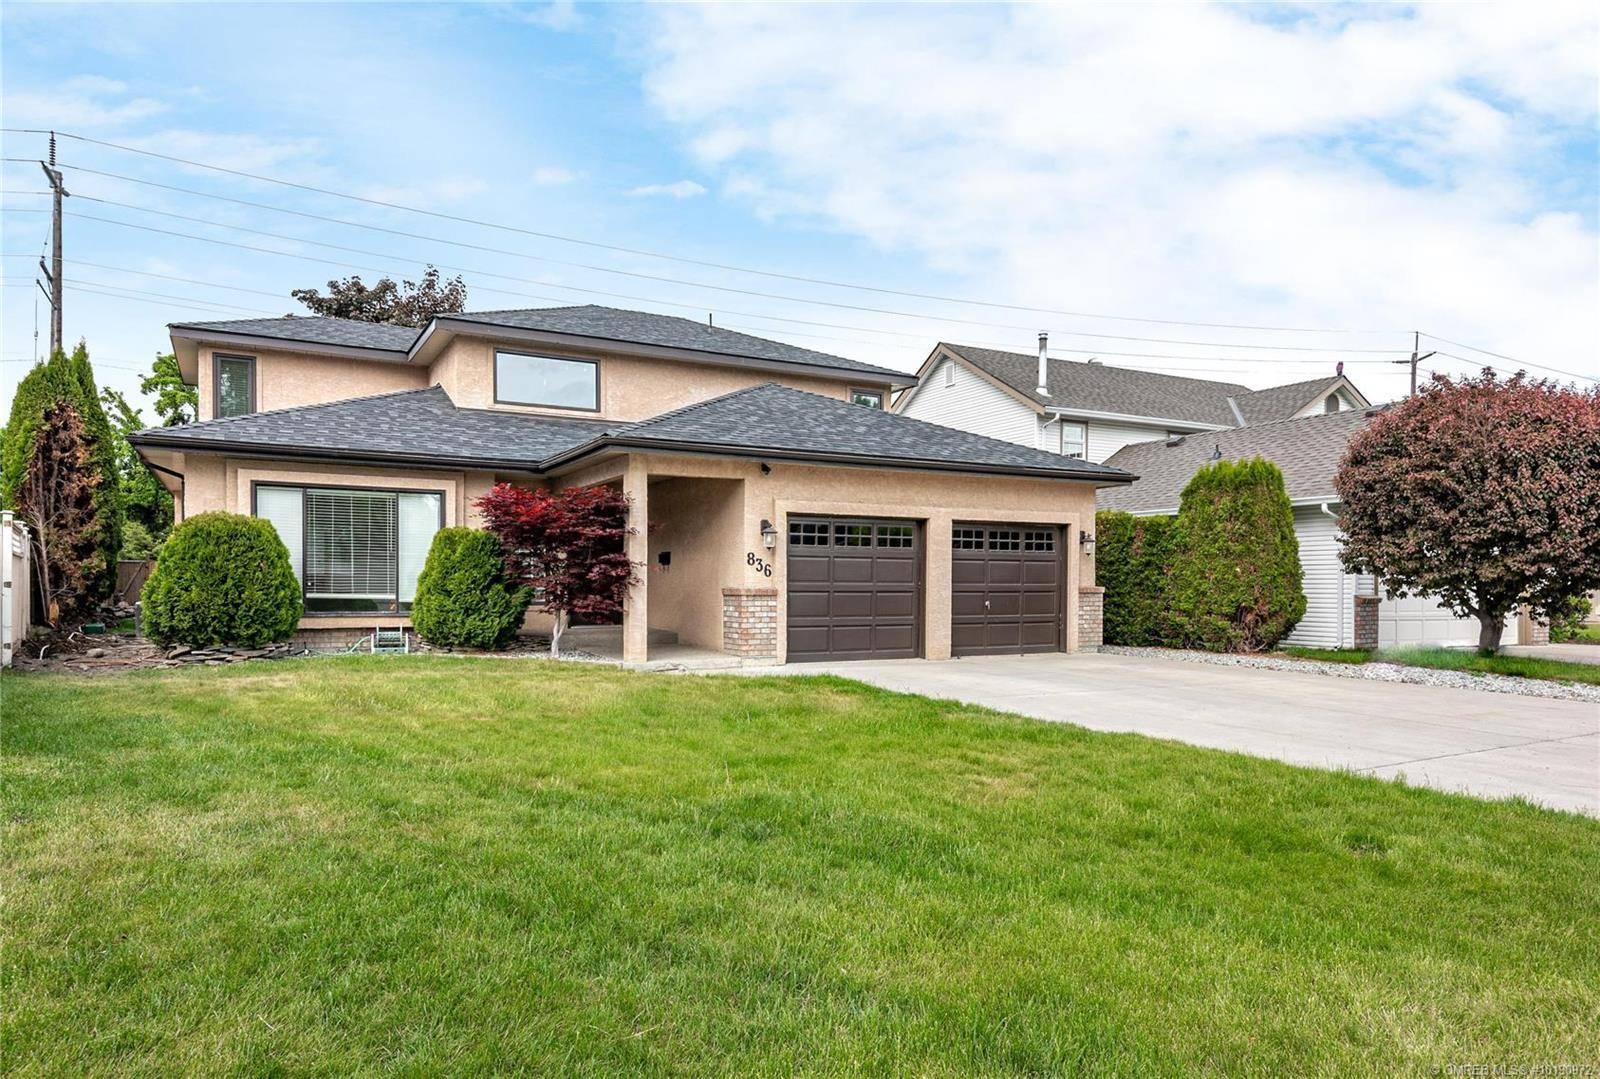 House for sale at 836 Springside Ct Kelowna British Columbia - MLS: 10190972